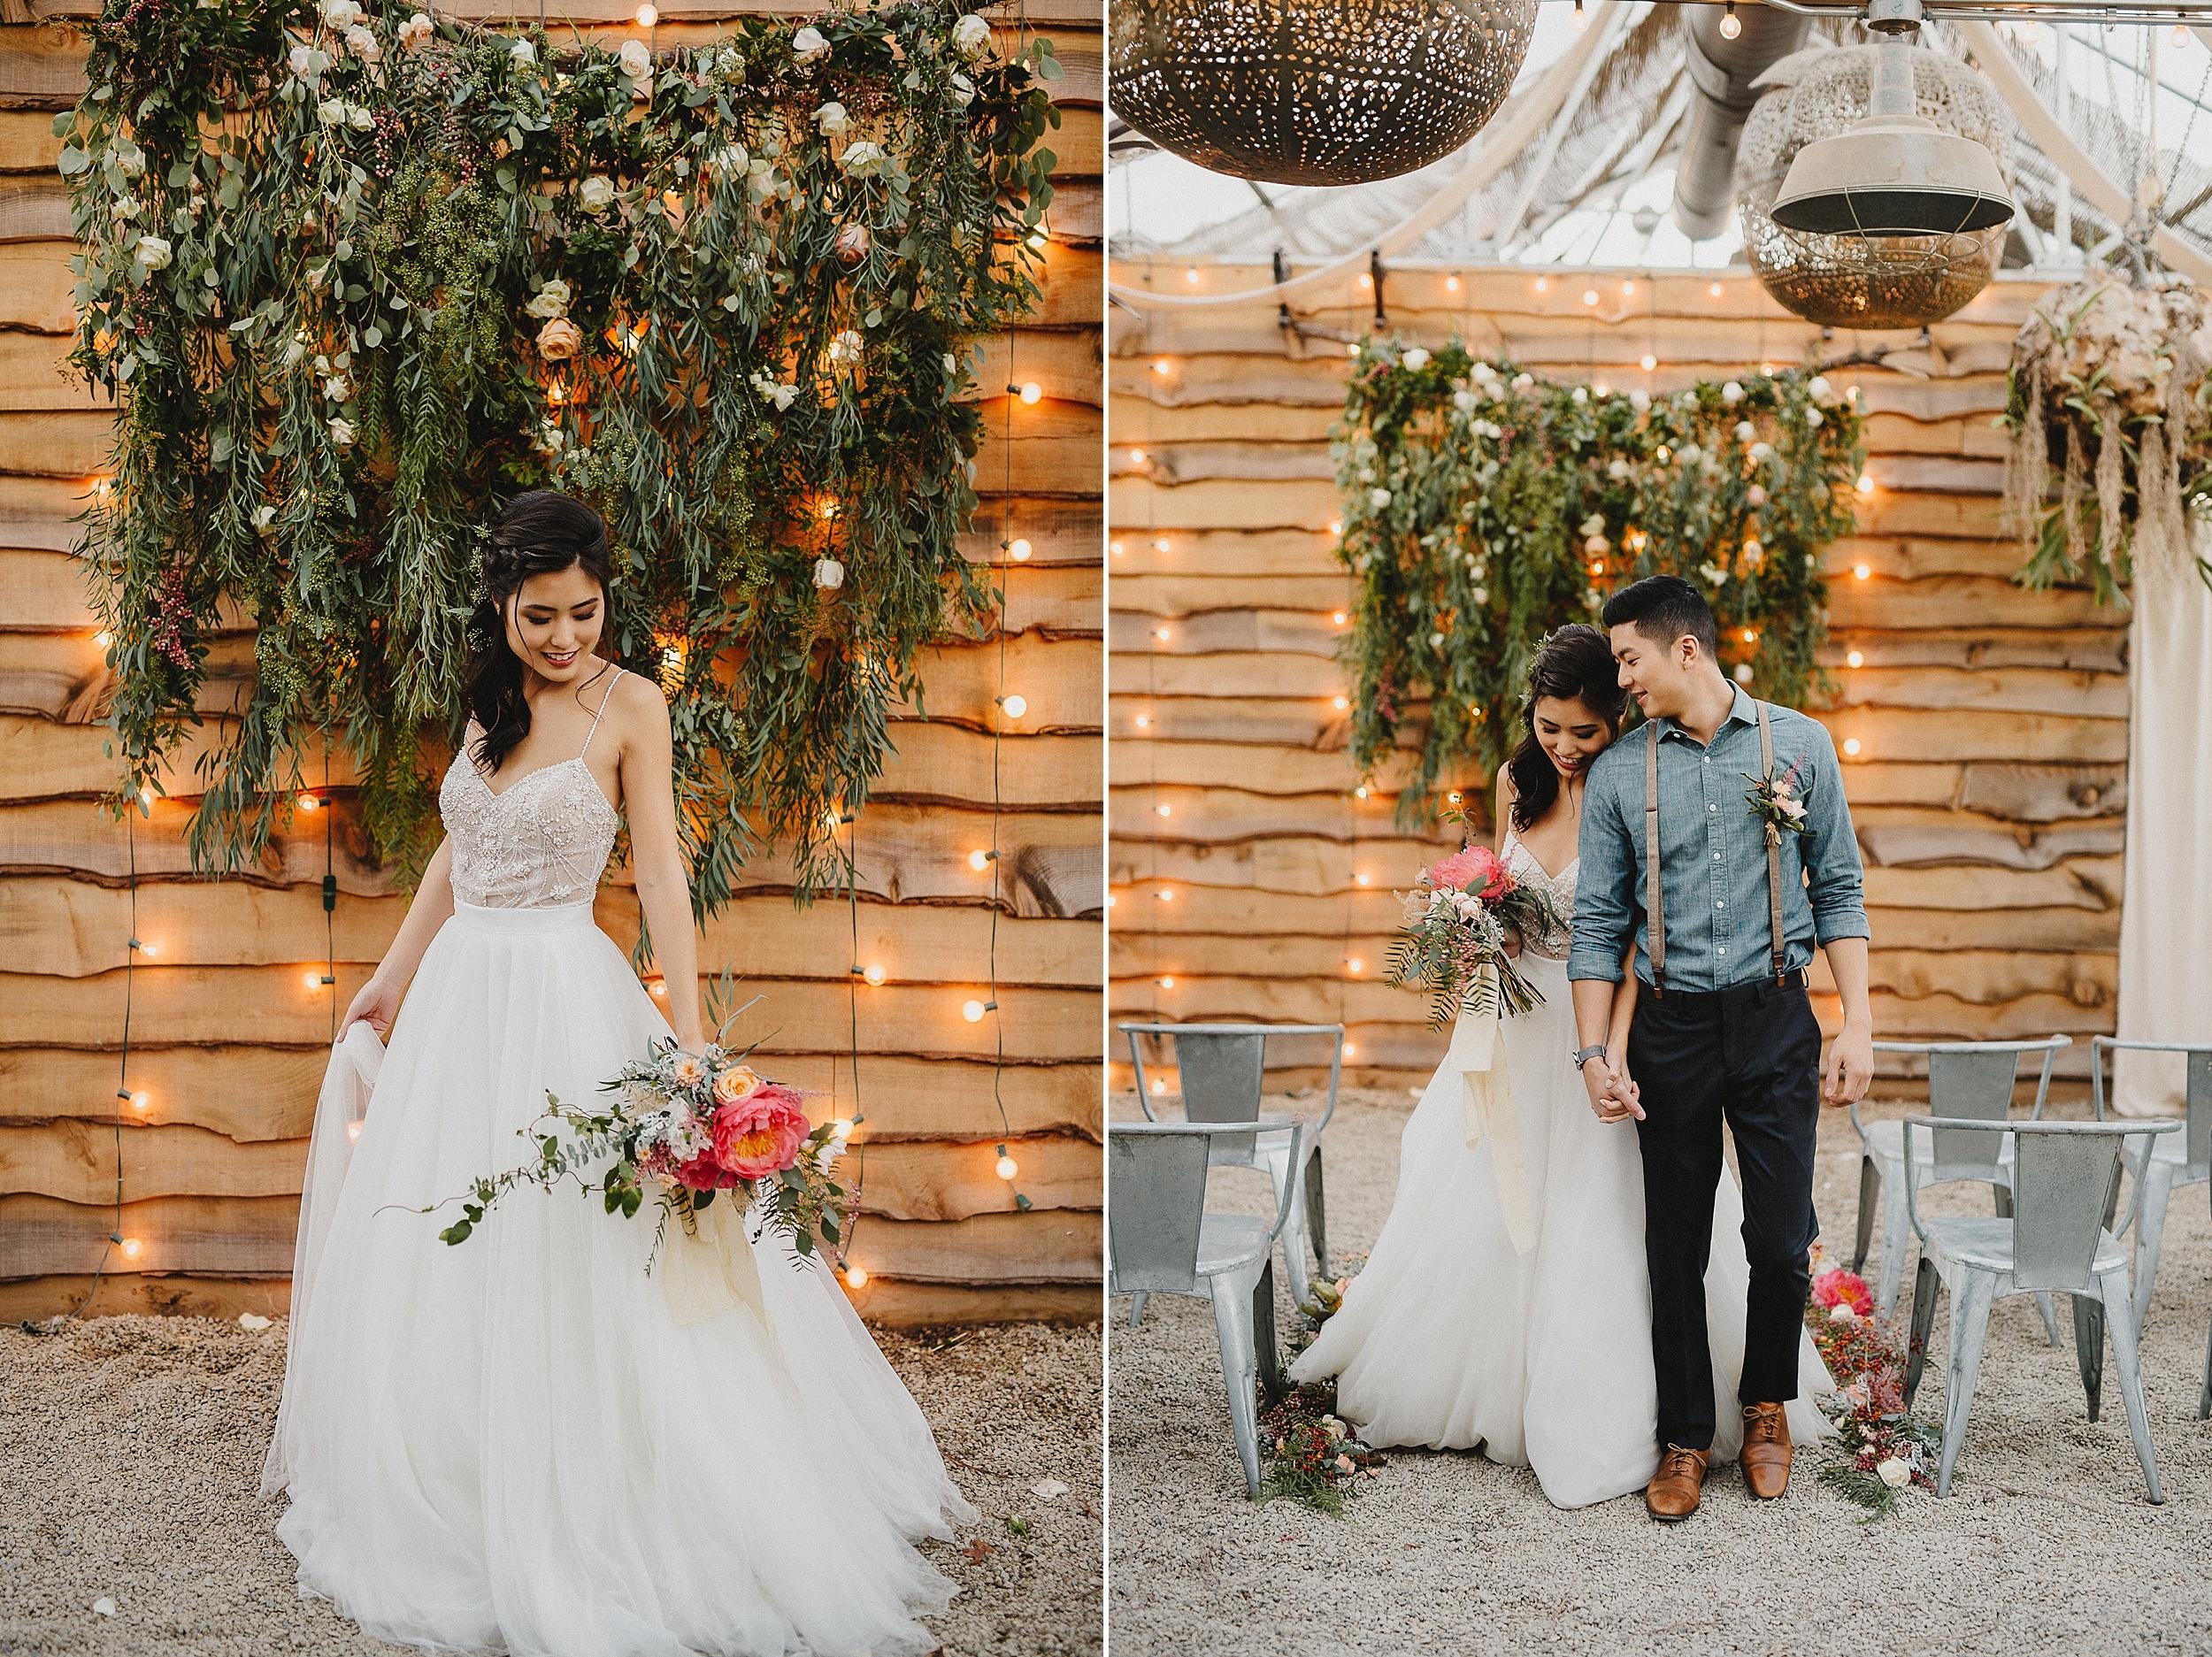 terrain-at-styers-wedding-photography-77.jpg